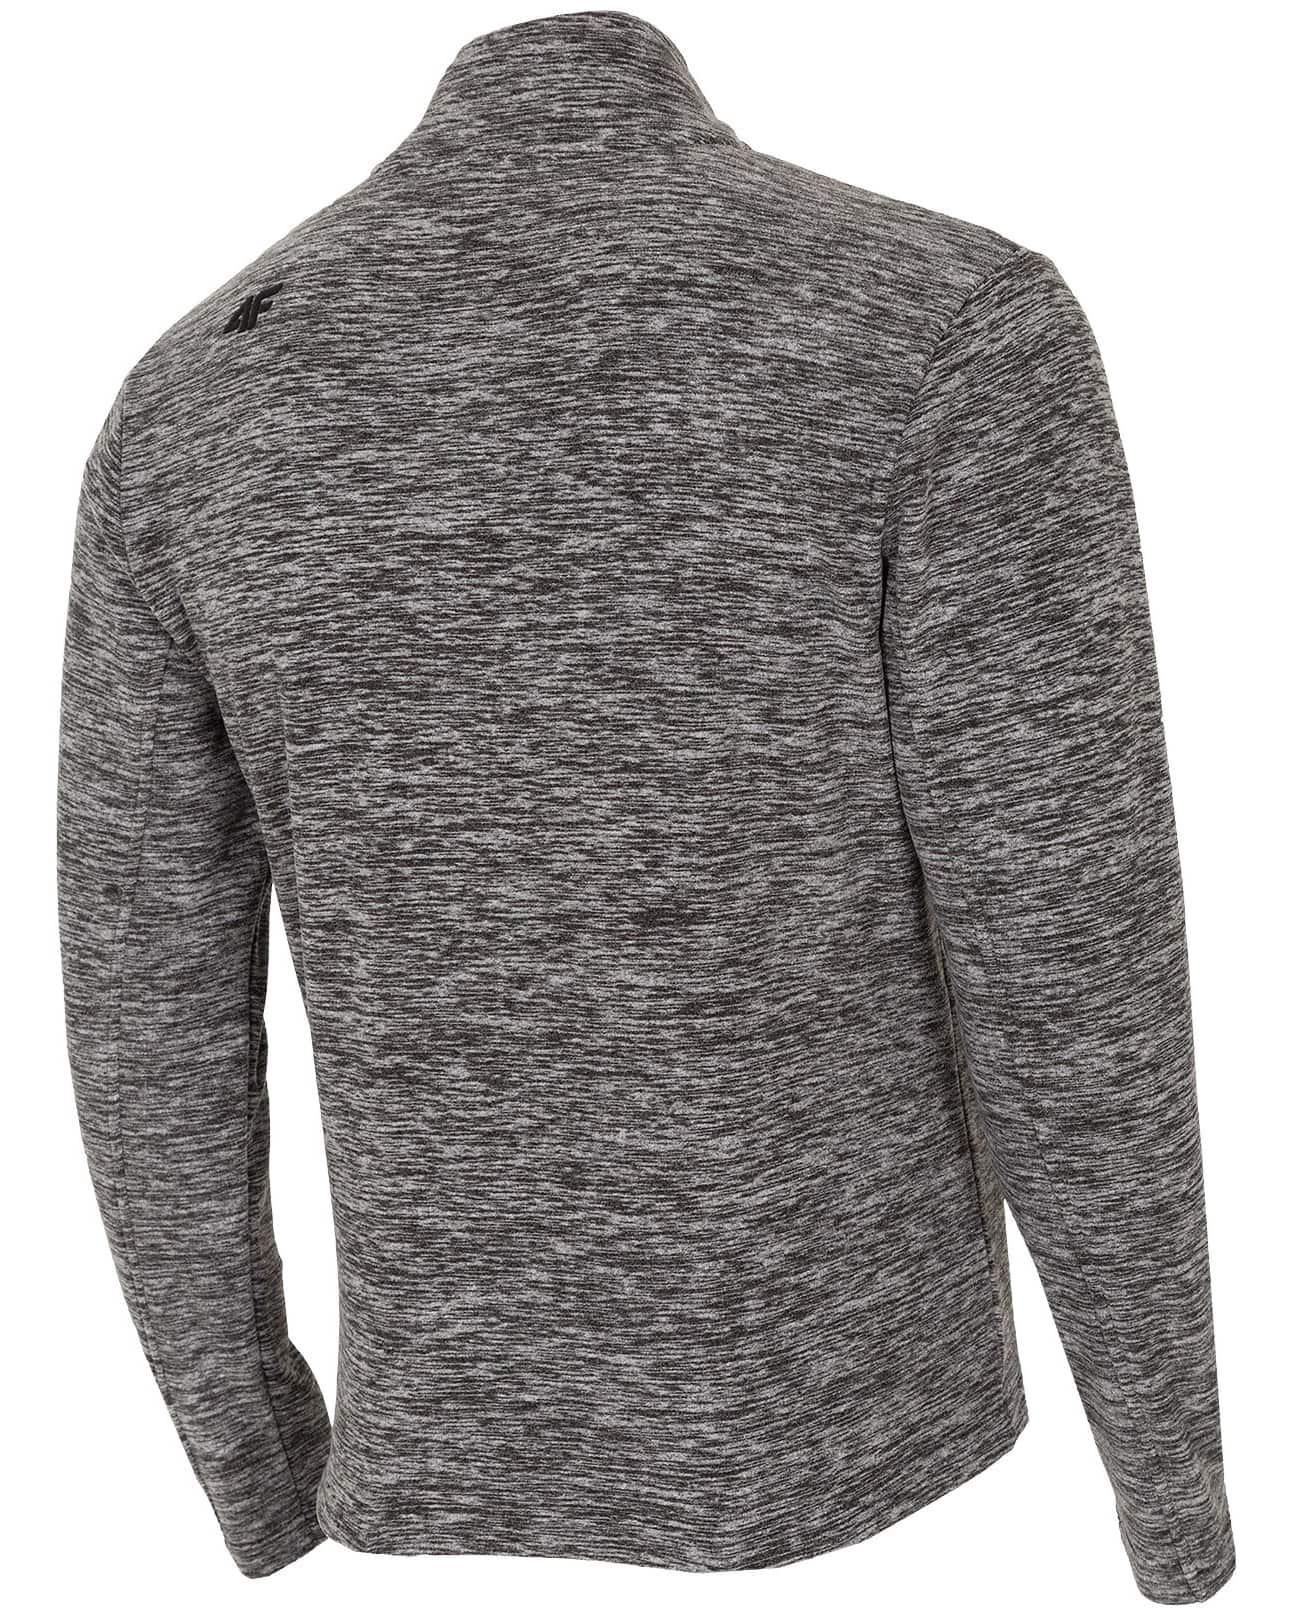 4F Man's Fleece - Dark Grey Melange